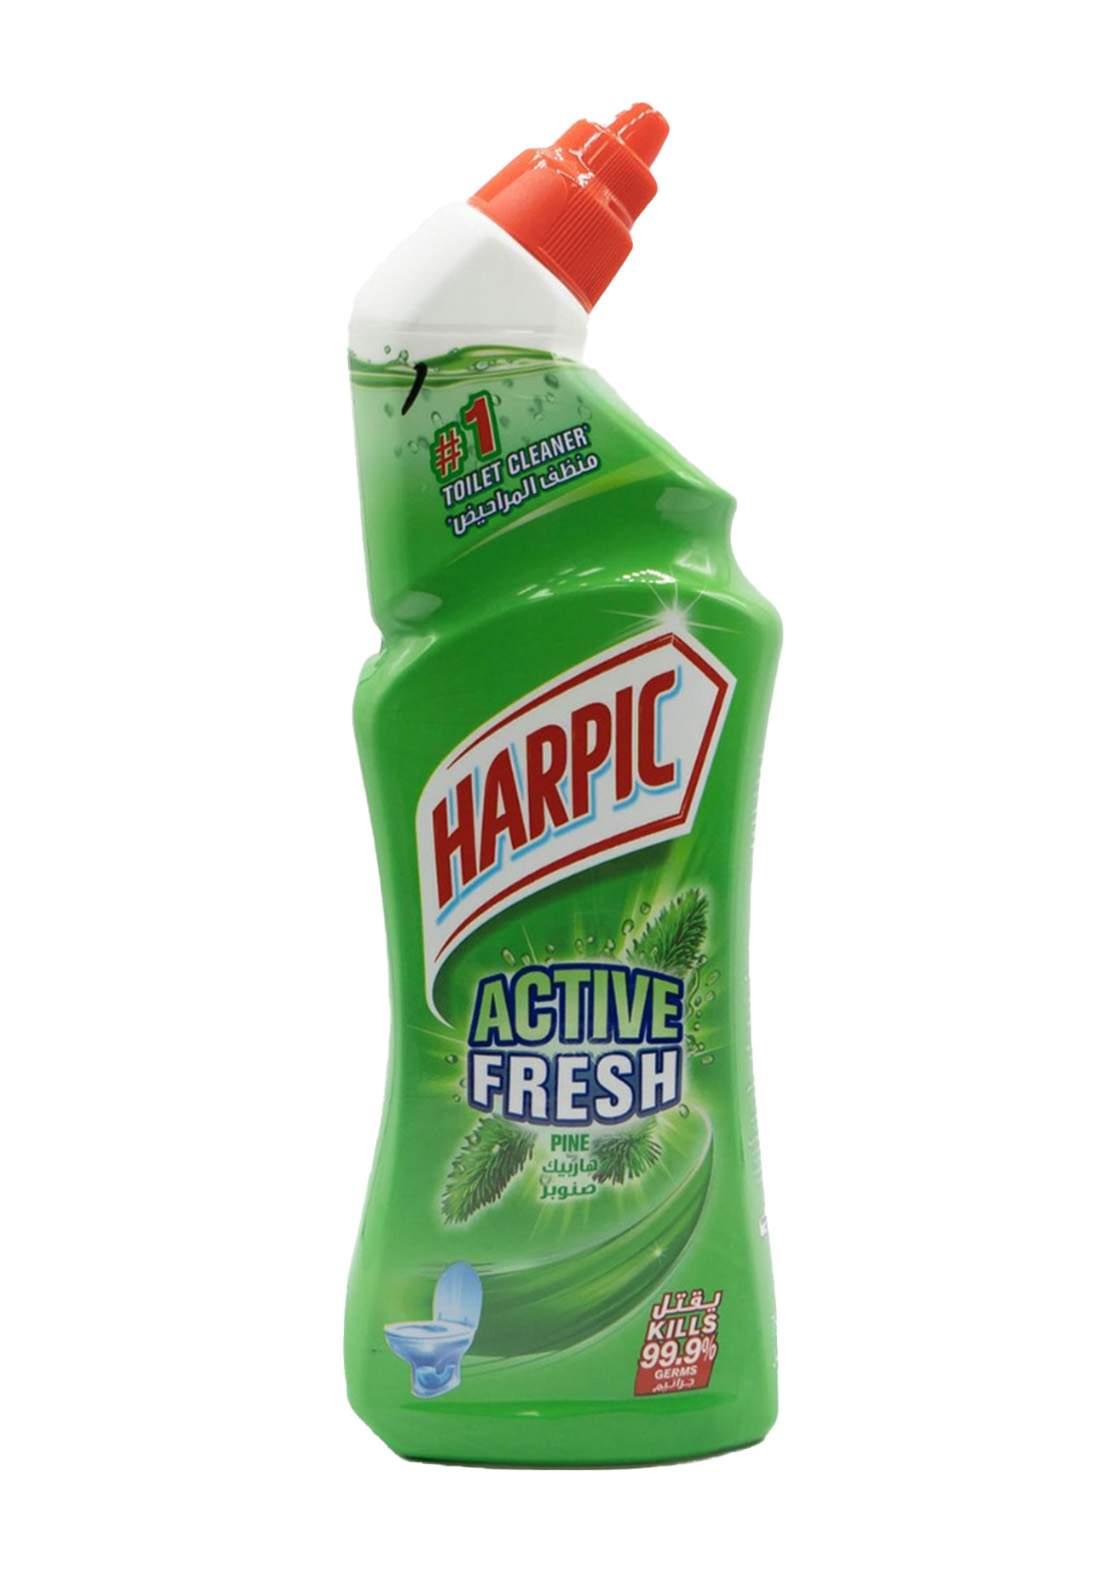 Harpic active fresh750 ml هاربيك اكتف فريش